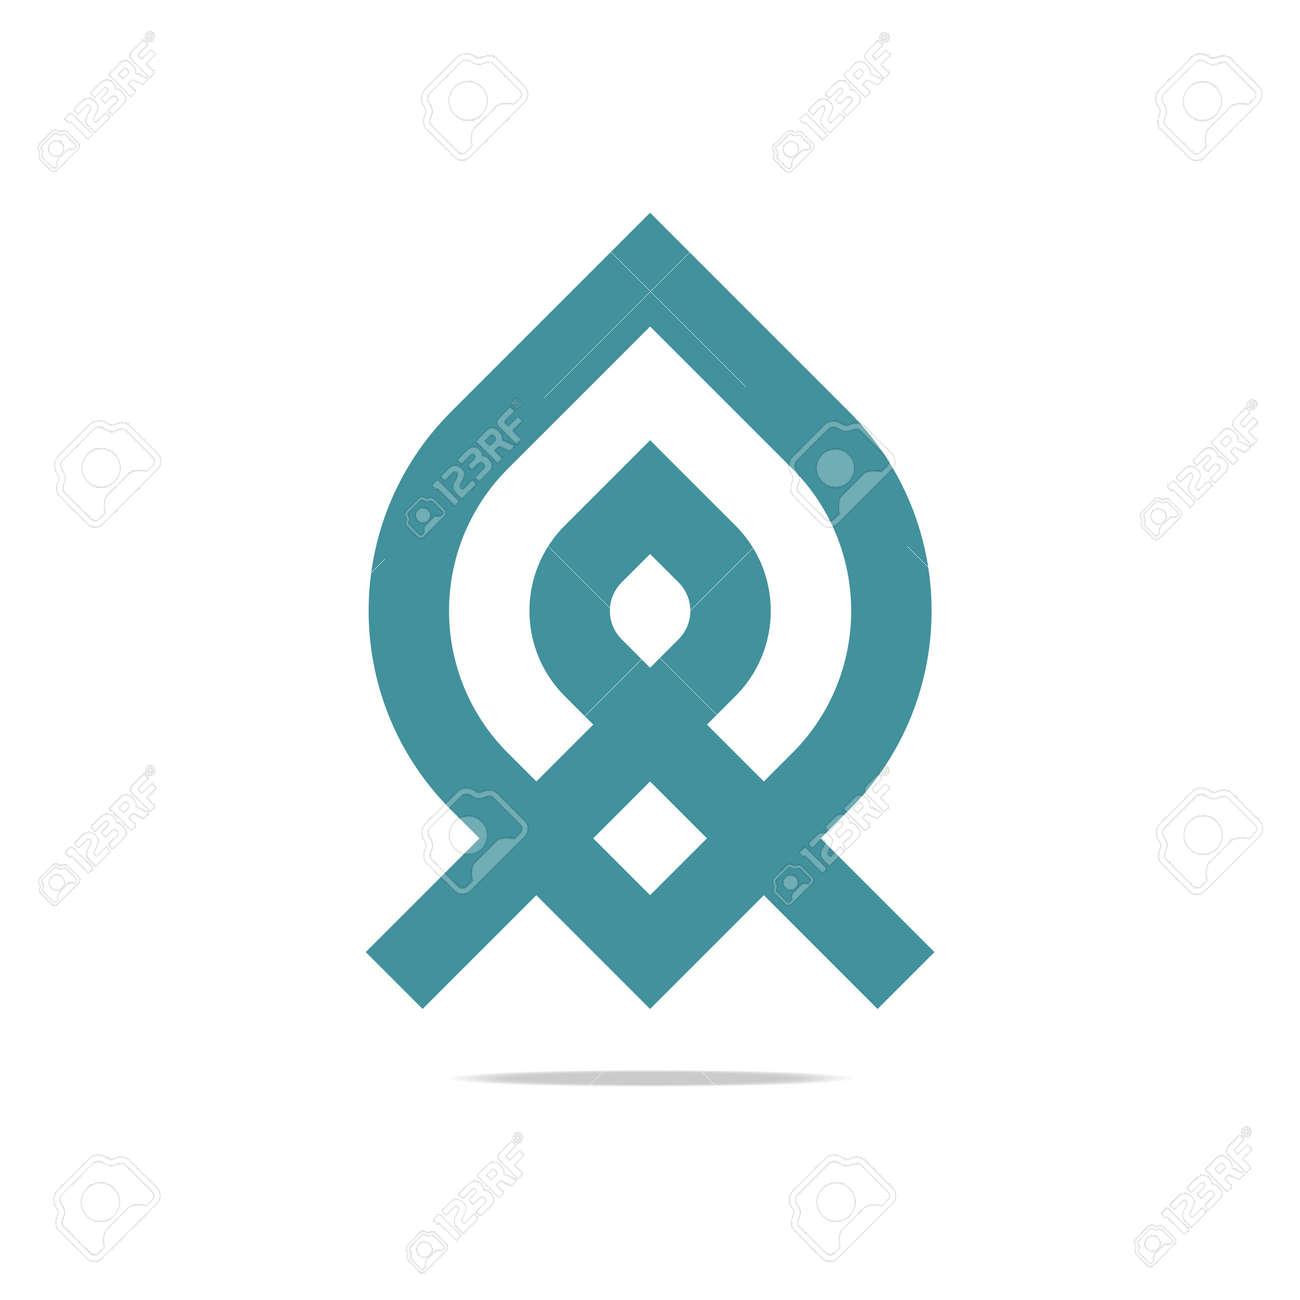 Logo design element company name bussines letter symbol icon logo design element company name bussines letter symbol icon stock vector 45283836 buycottarizona